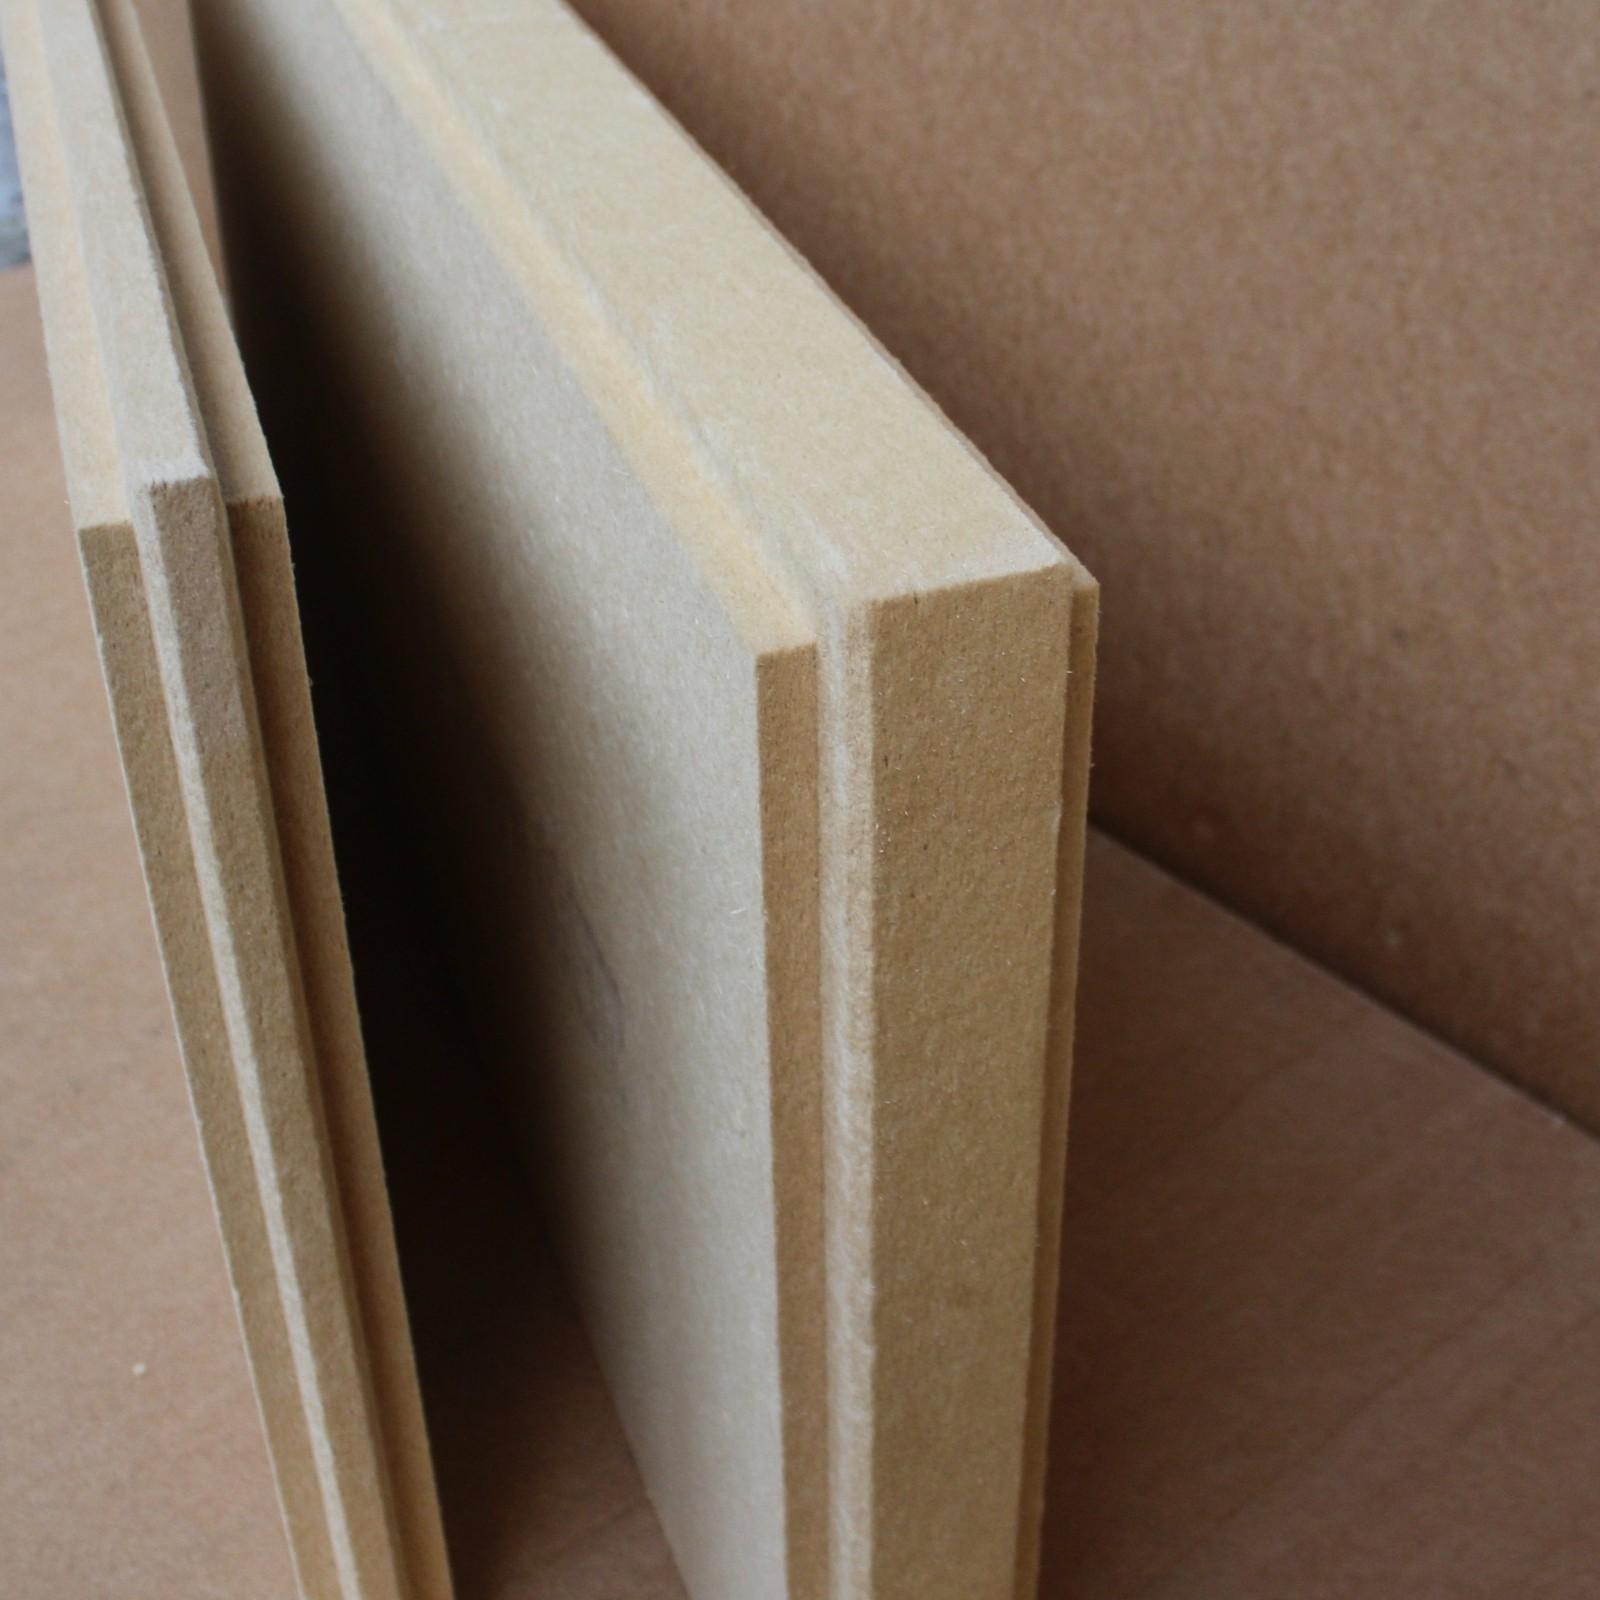 STEICO protect dry 100 mm 4-seitig Nut und Feder